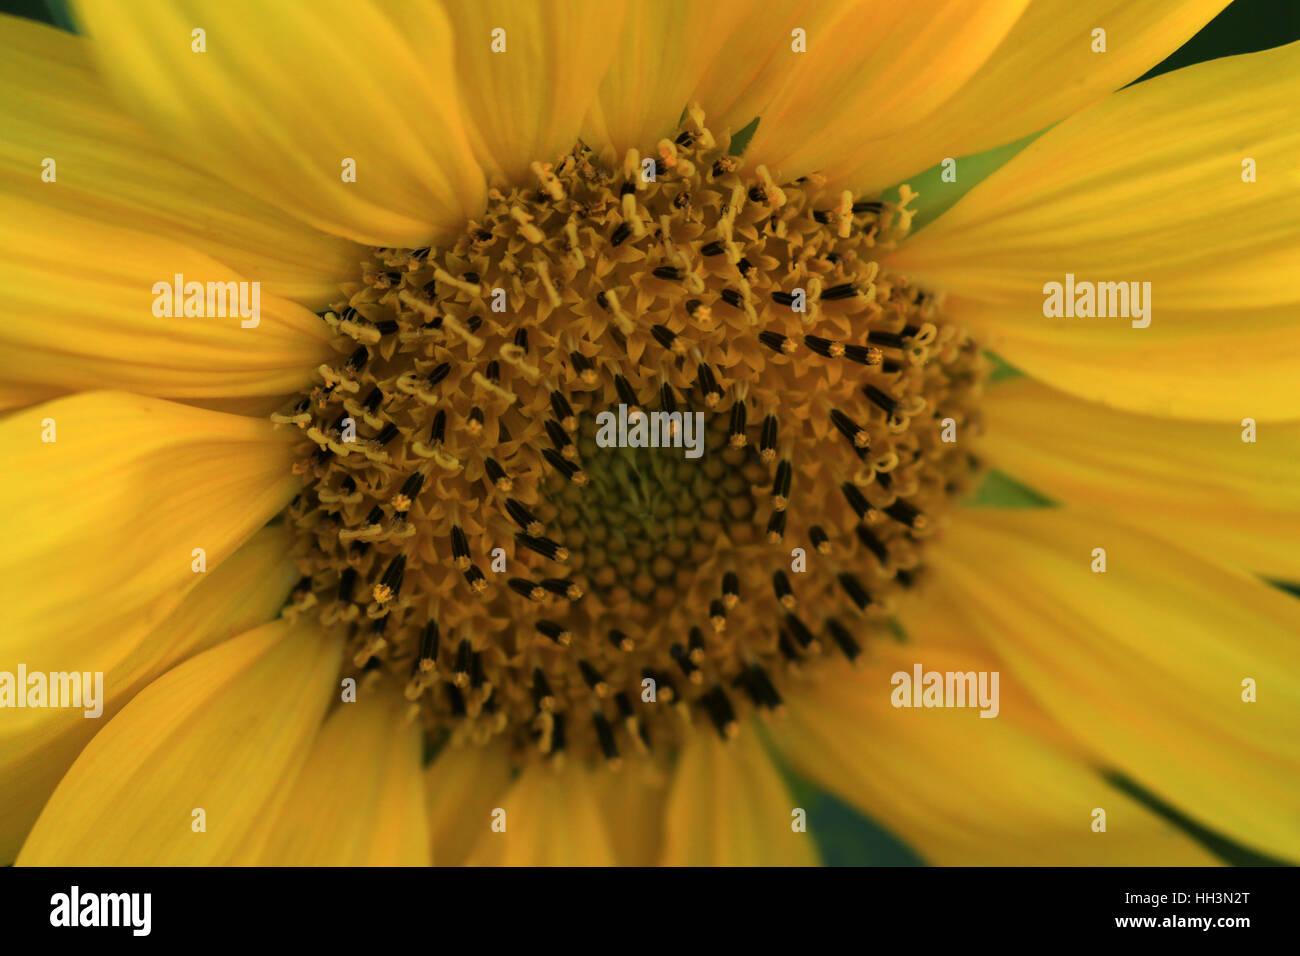 Blühende Sonnenblume im Garten - Stock Image